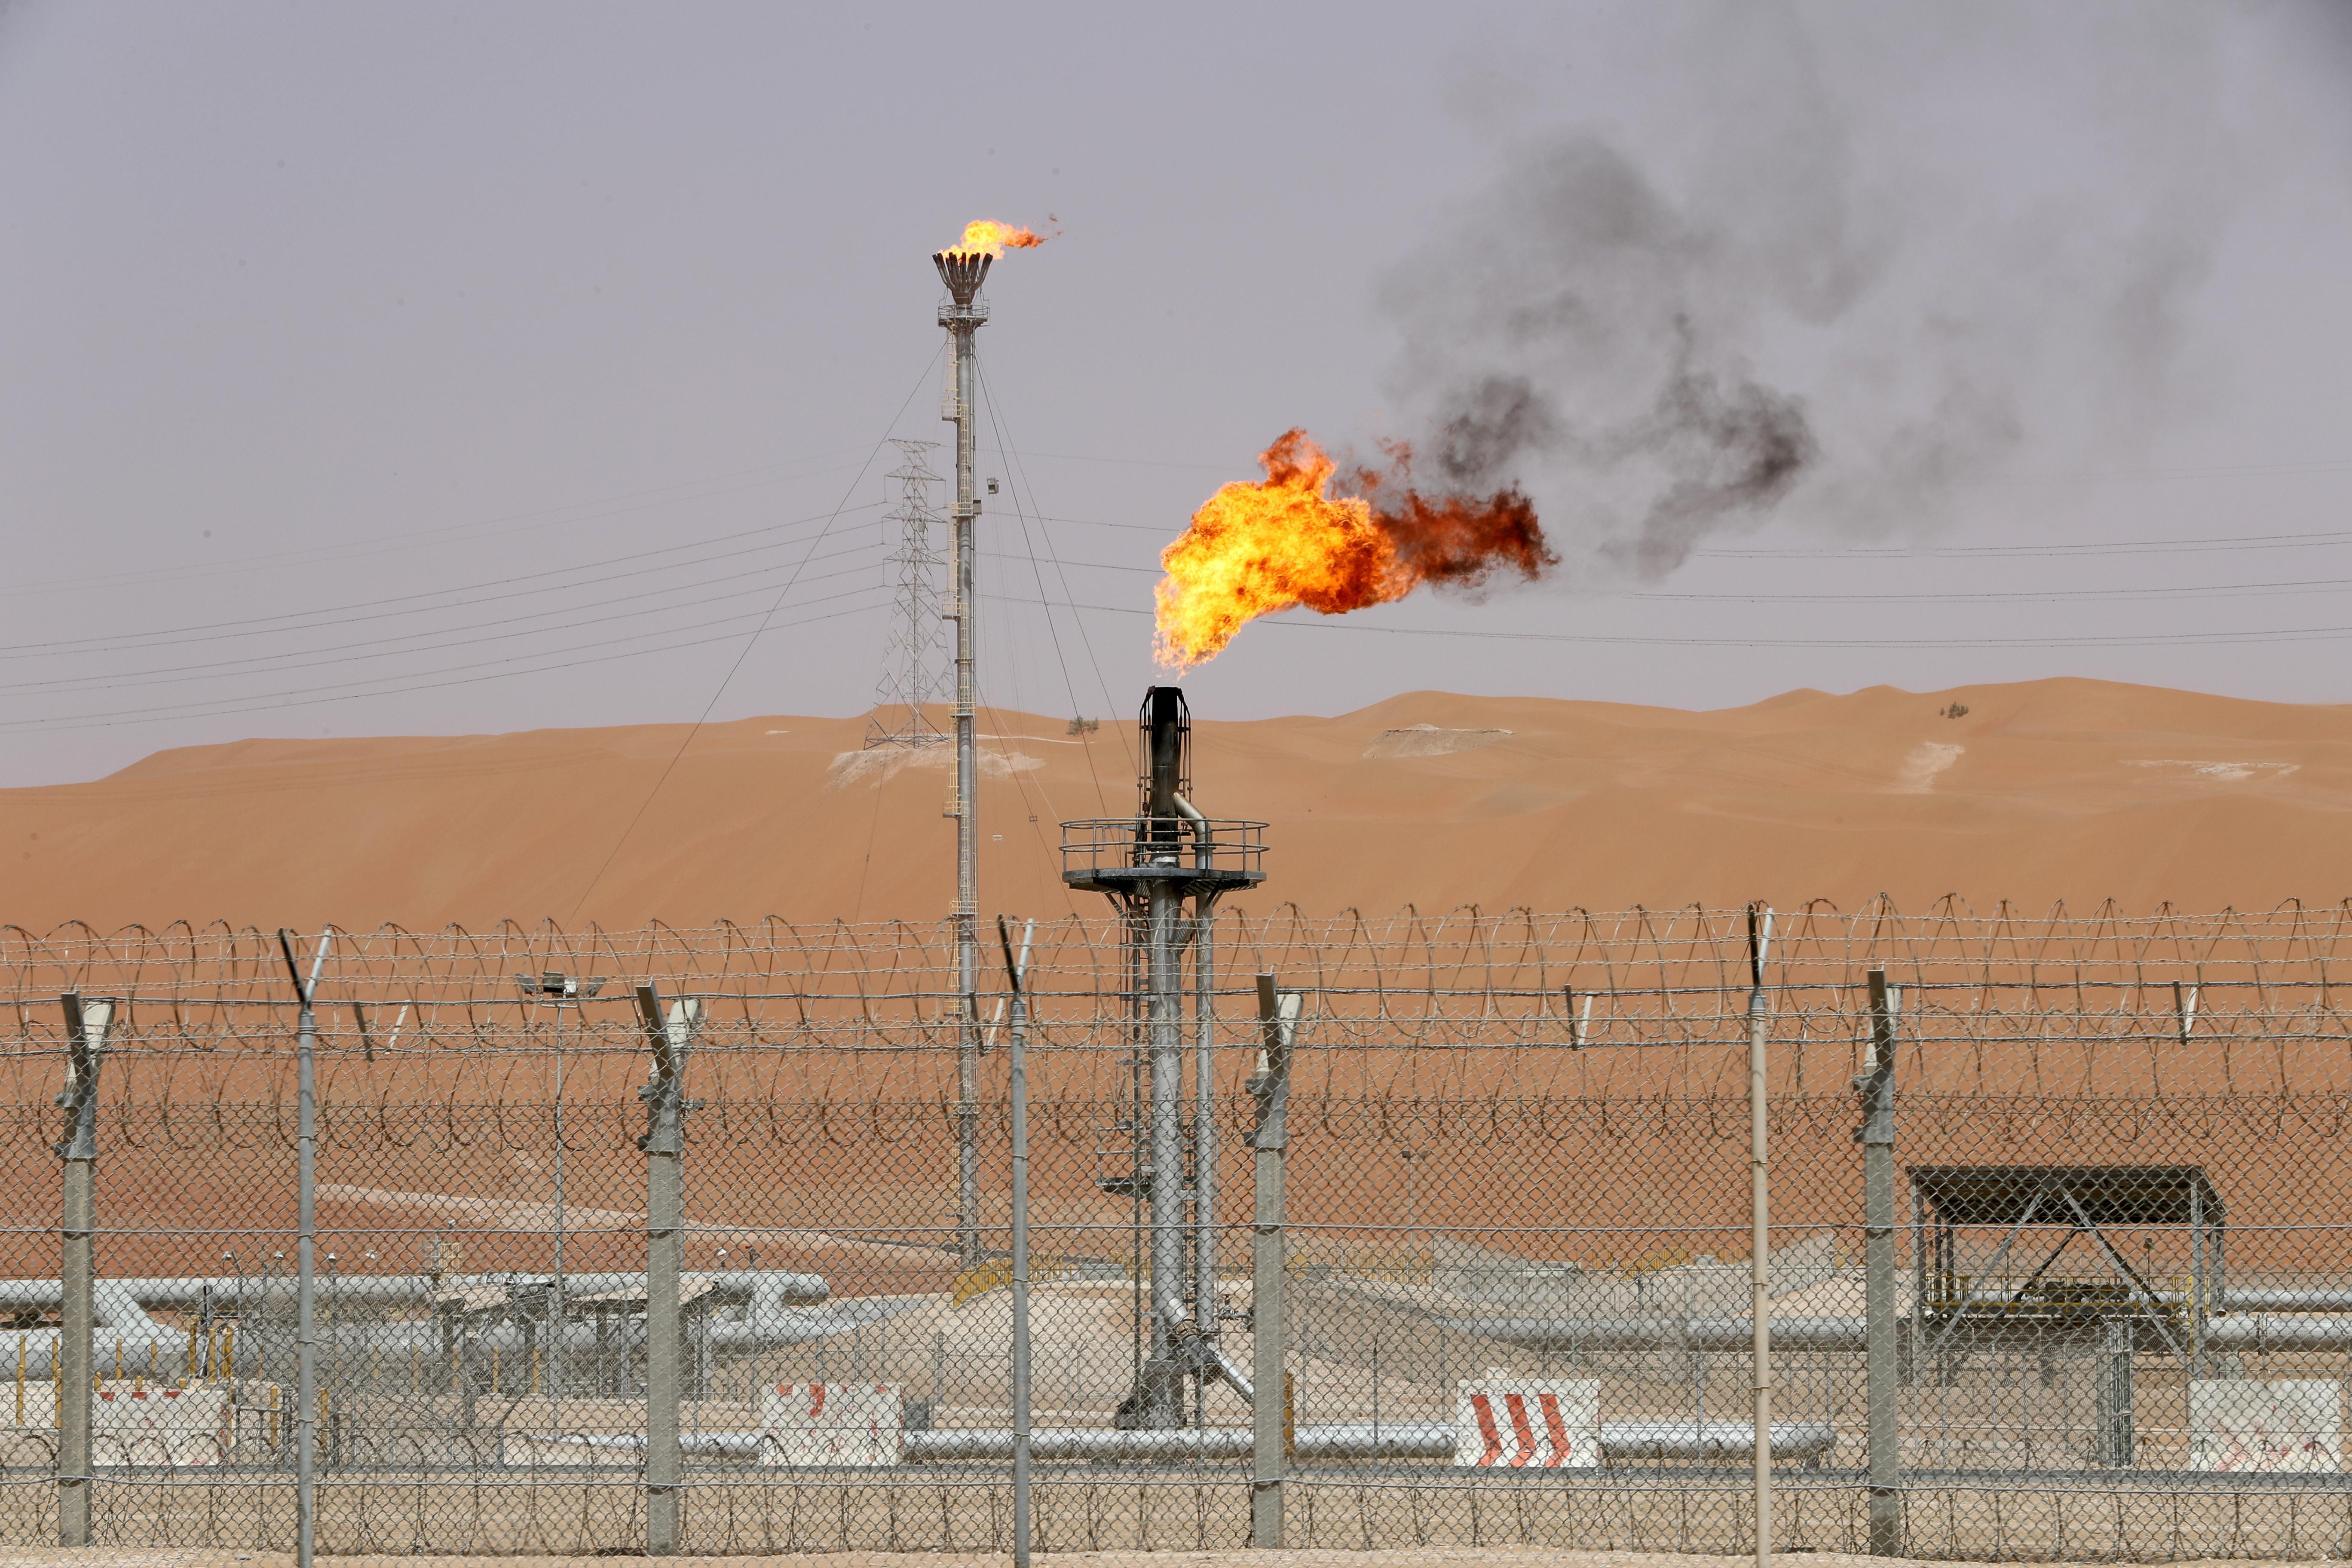 Saudi Arabia to ship less oil in December as it floats cut talks possibility